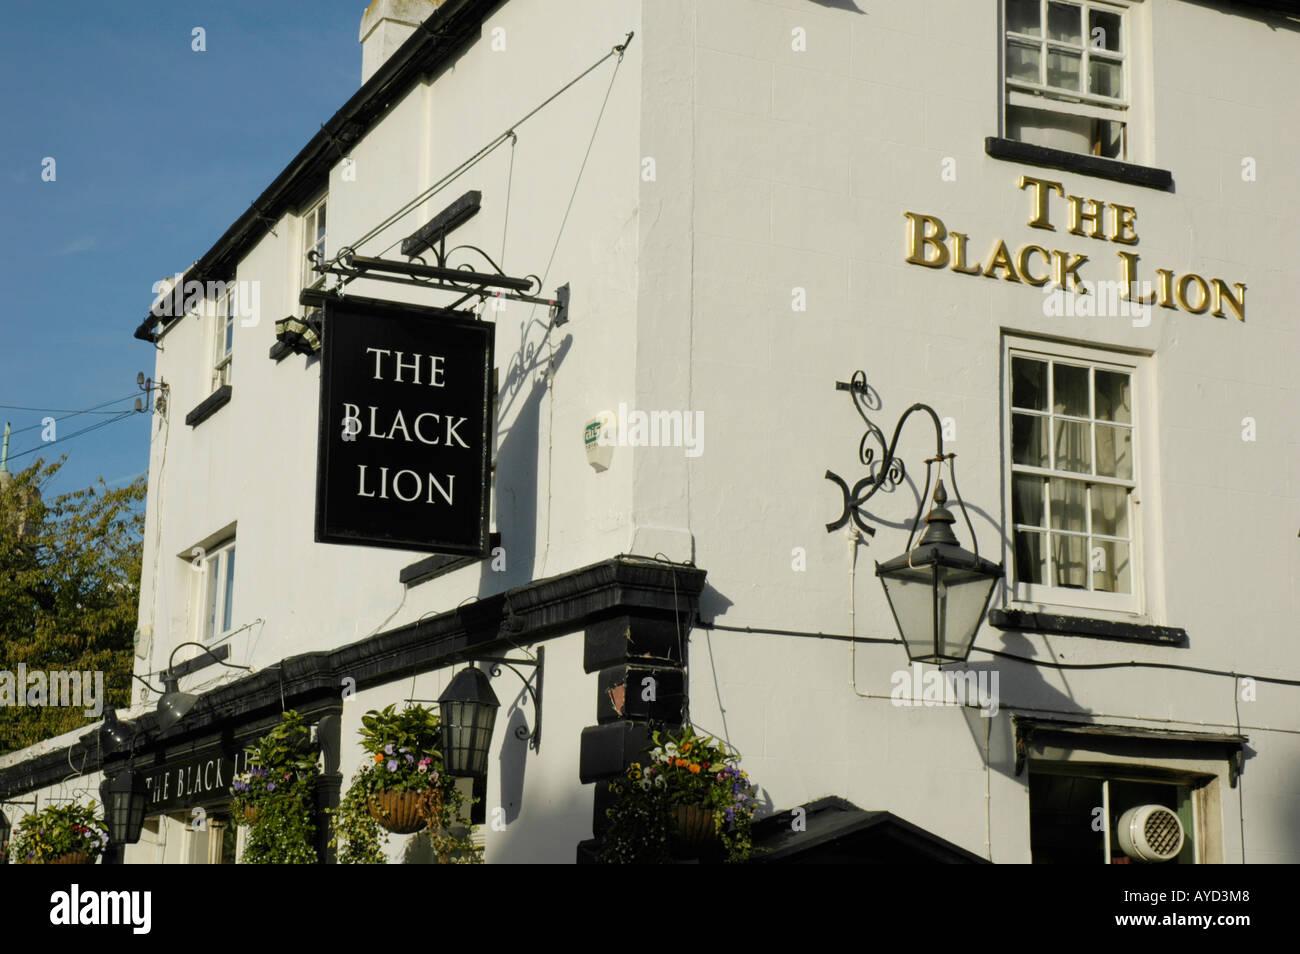 The Black Lion pub in Black Lion Lane Chiswick London England - Stock Image